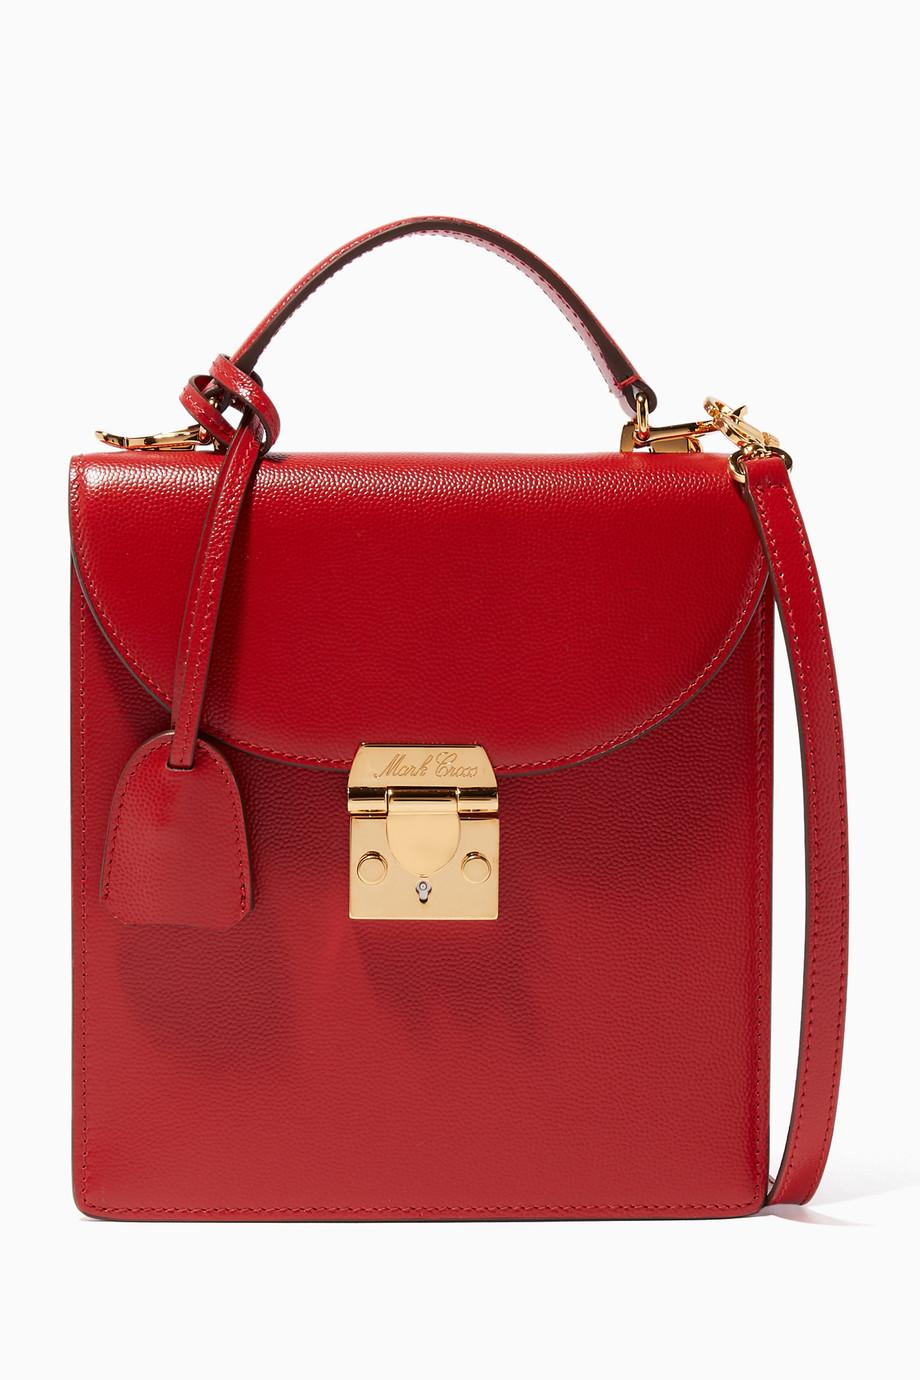 6b794e12eb558 تسوق حقيبة بيد علوية أب تاون حمراء مارك كروس أحمر للنساء